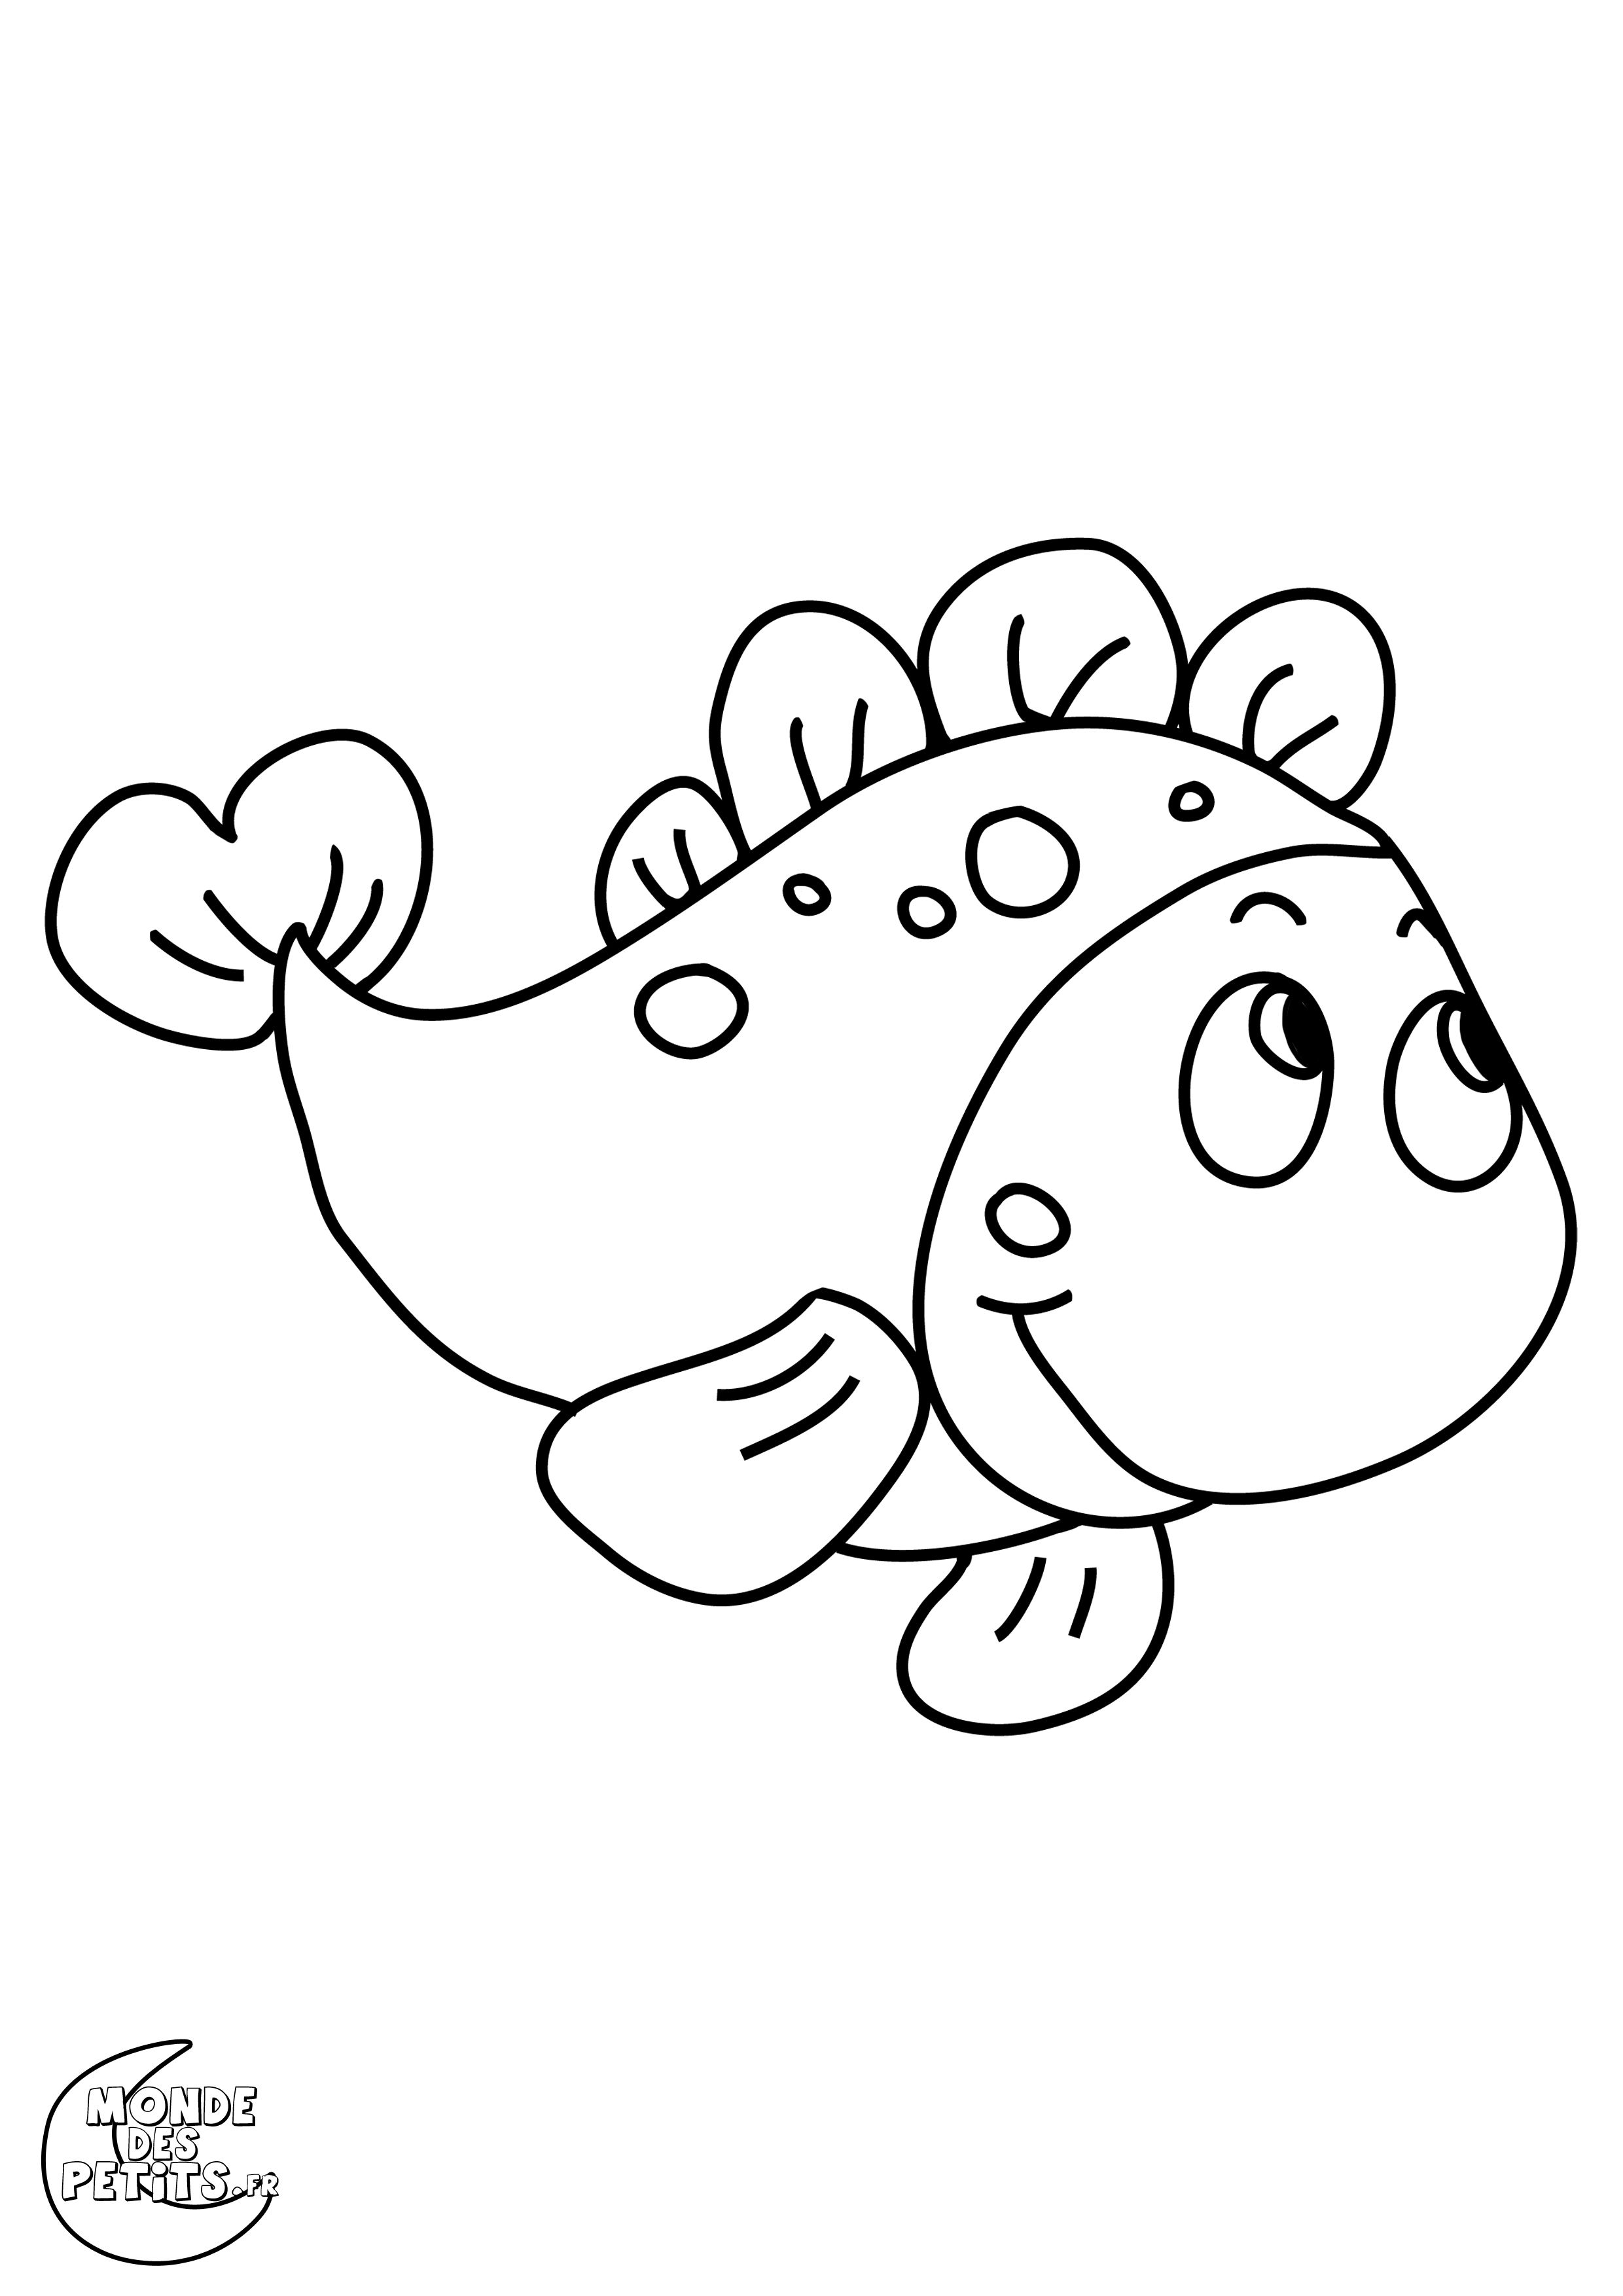 Coloriage poisson colorier dessin imprimer animaux - Dessin poisson ...